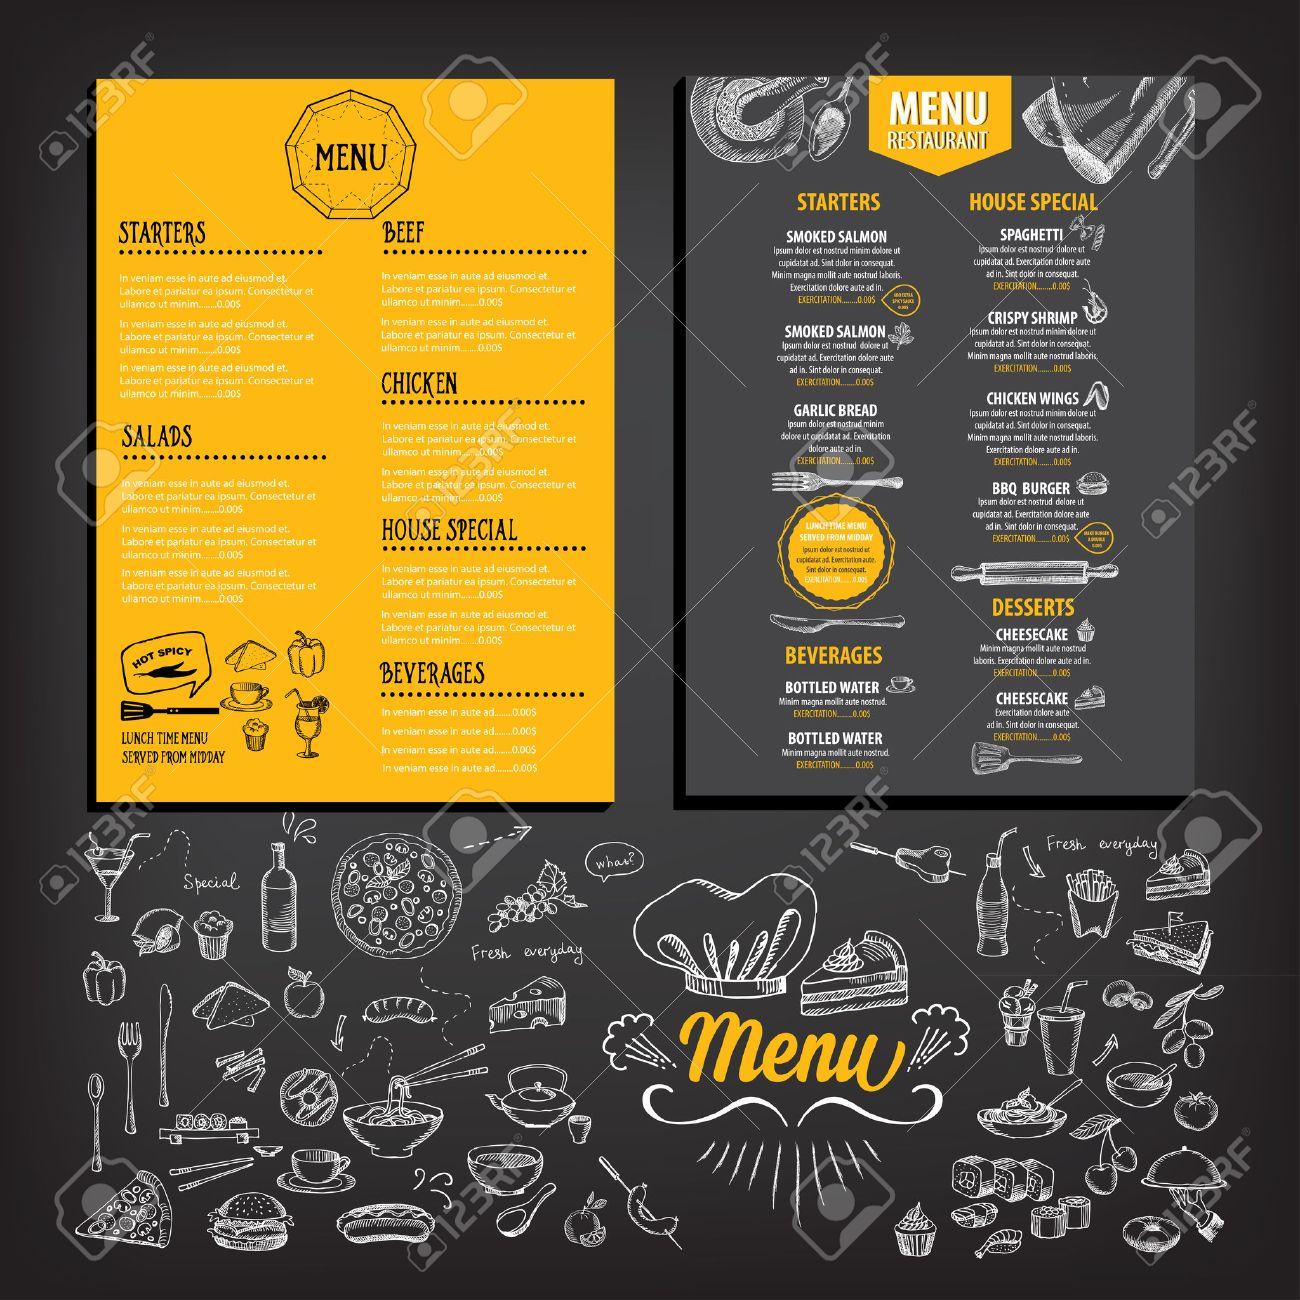 Restaurant Cafe Menu Template Design Food Flyer Royalty Free – Free Cafe Menu Templates for Word